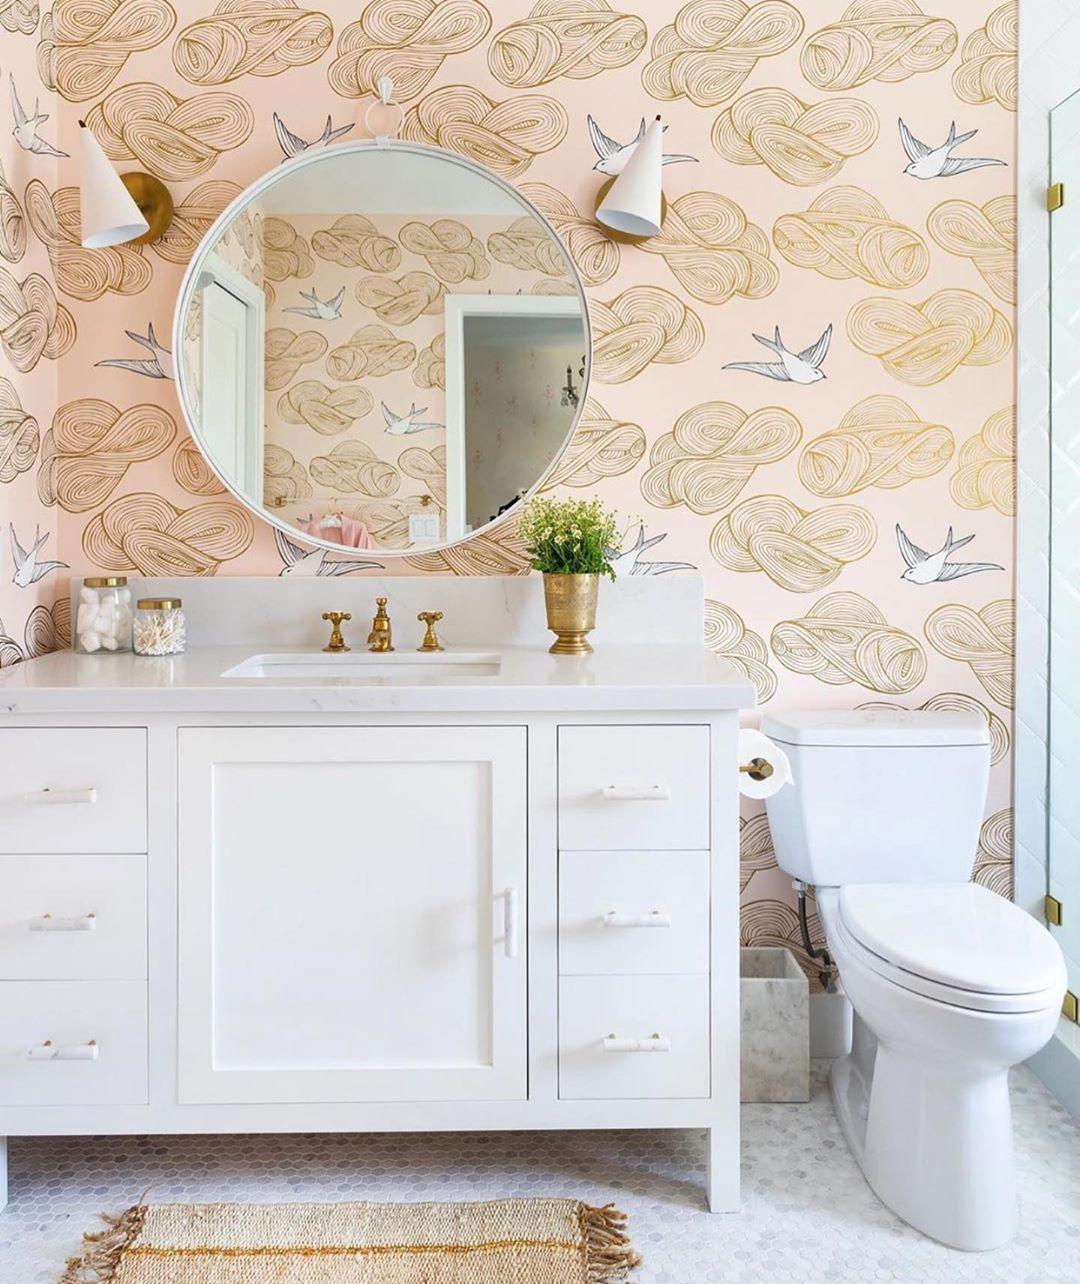 Pin By Bree On Jastell In 2021 Small Bathroom Wallpaper Daydream Wallpaper Blush Wallpaper